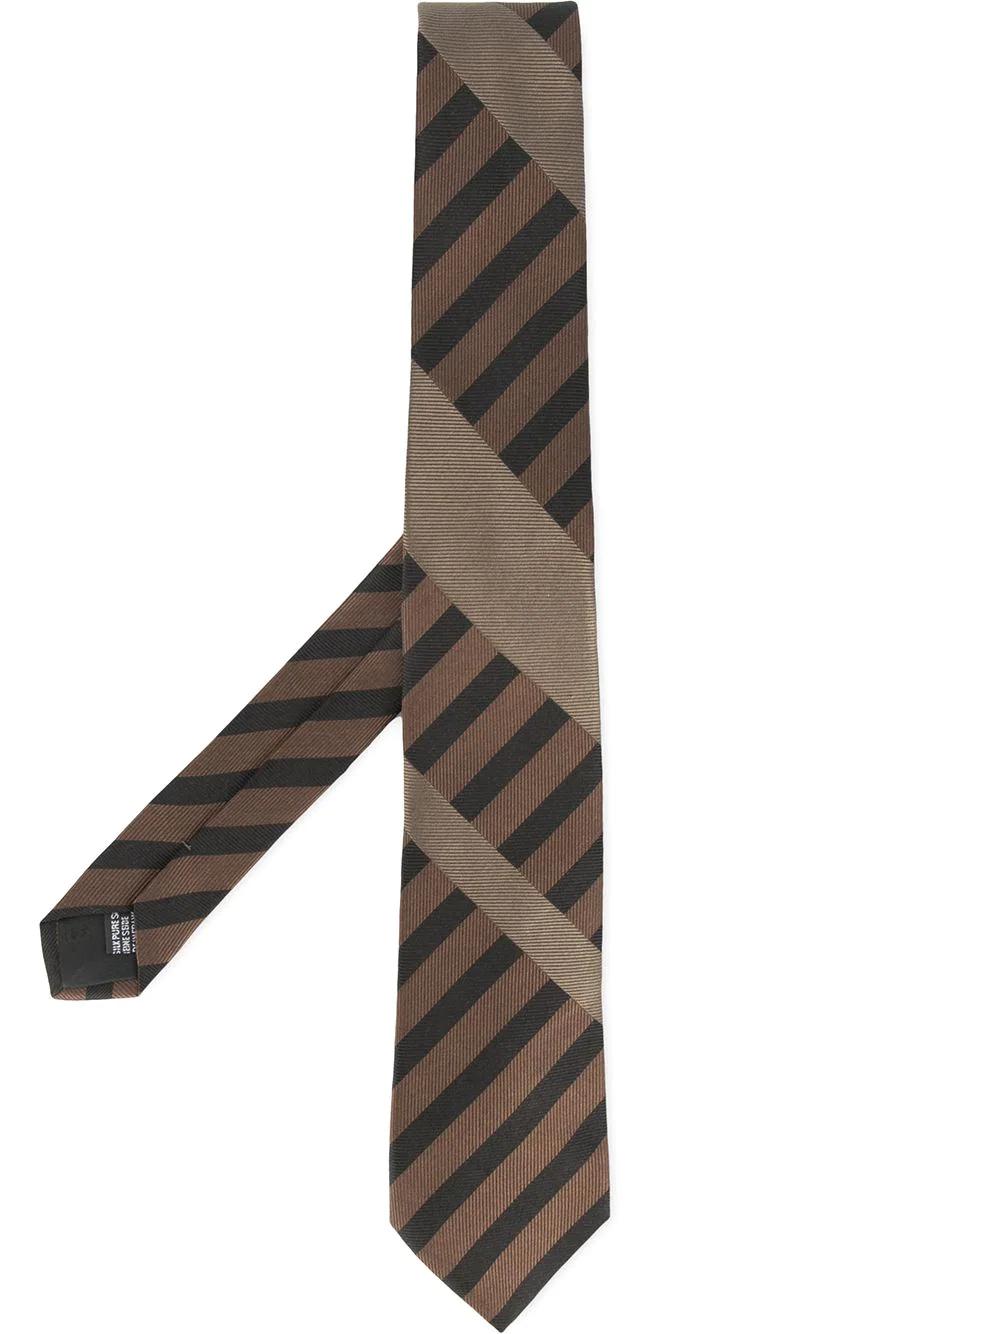 Cerruti 1881 | Cerruti 1881 галстук в диагональную полоску | Clouty